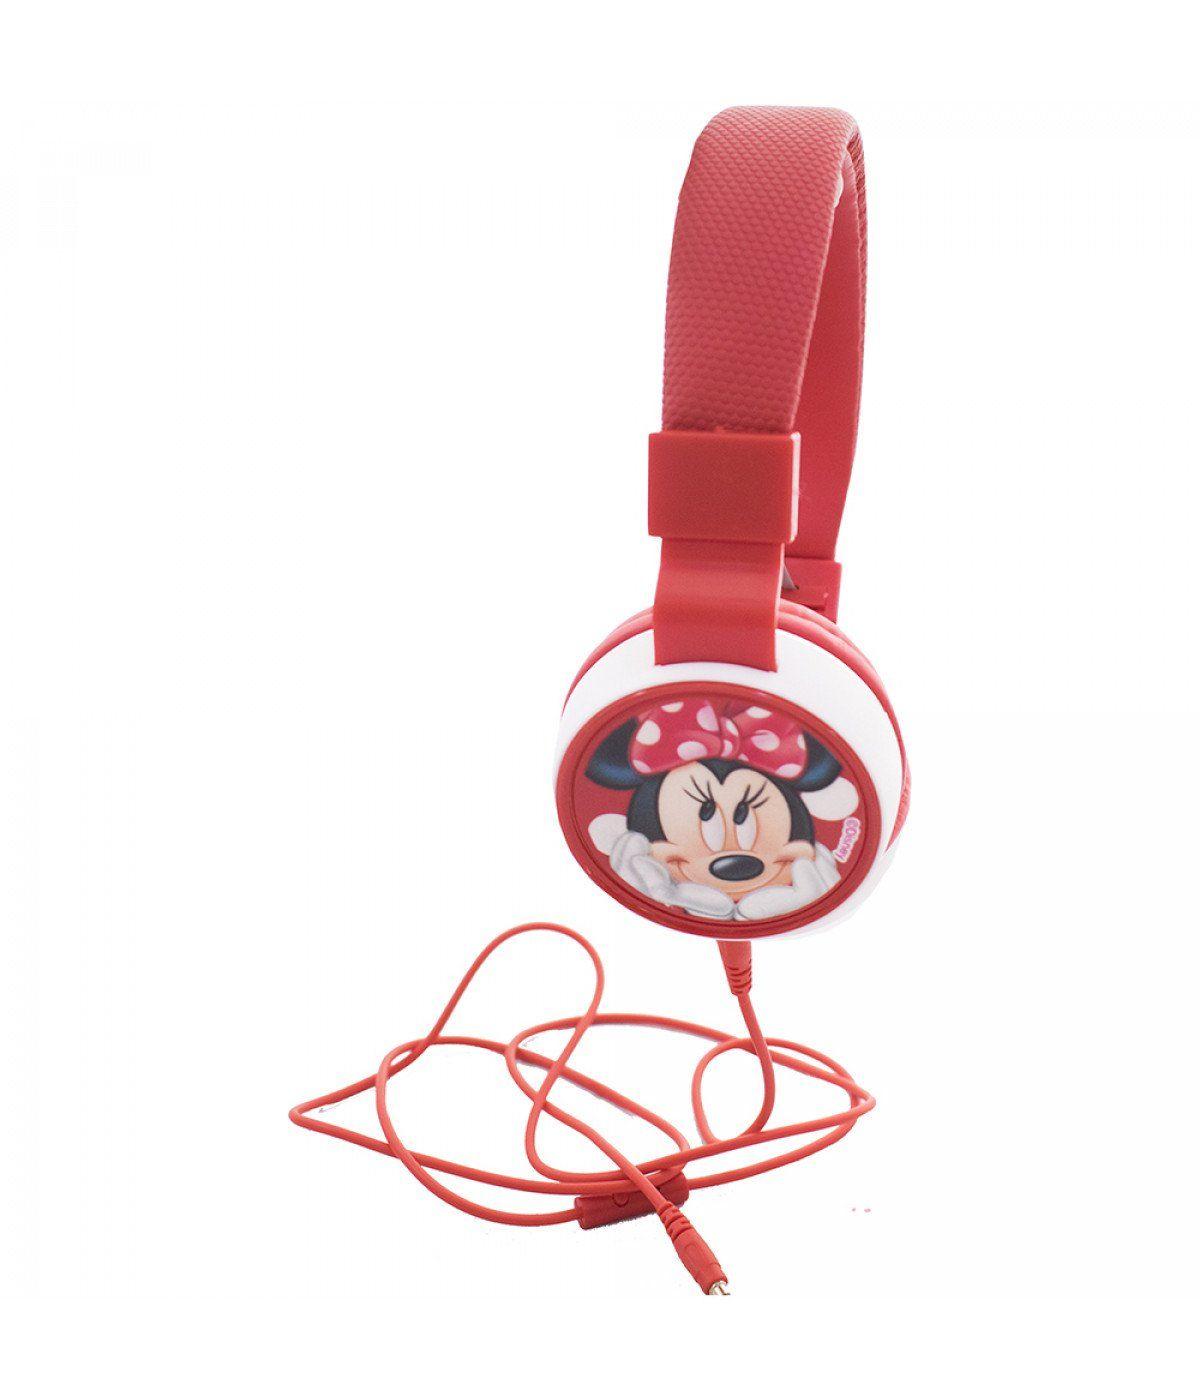 Fone de Ouvido Minnie Mouse: Disney